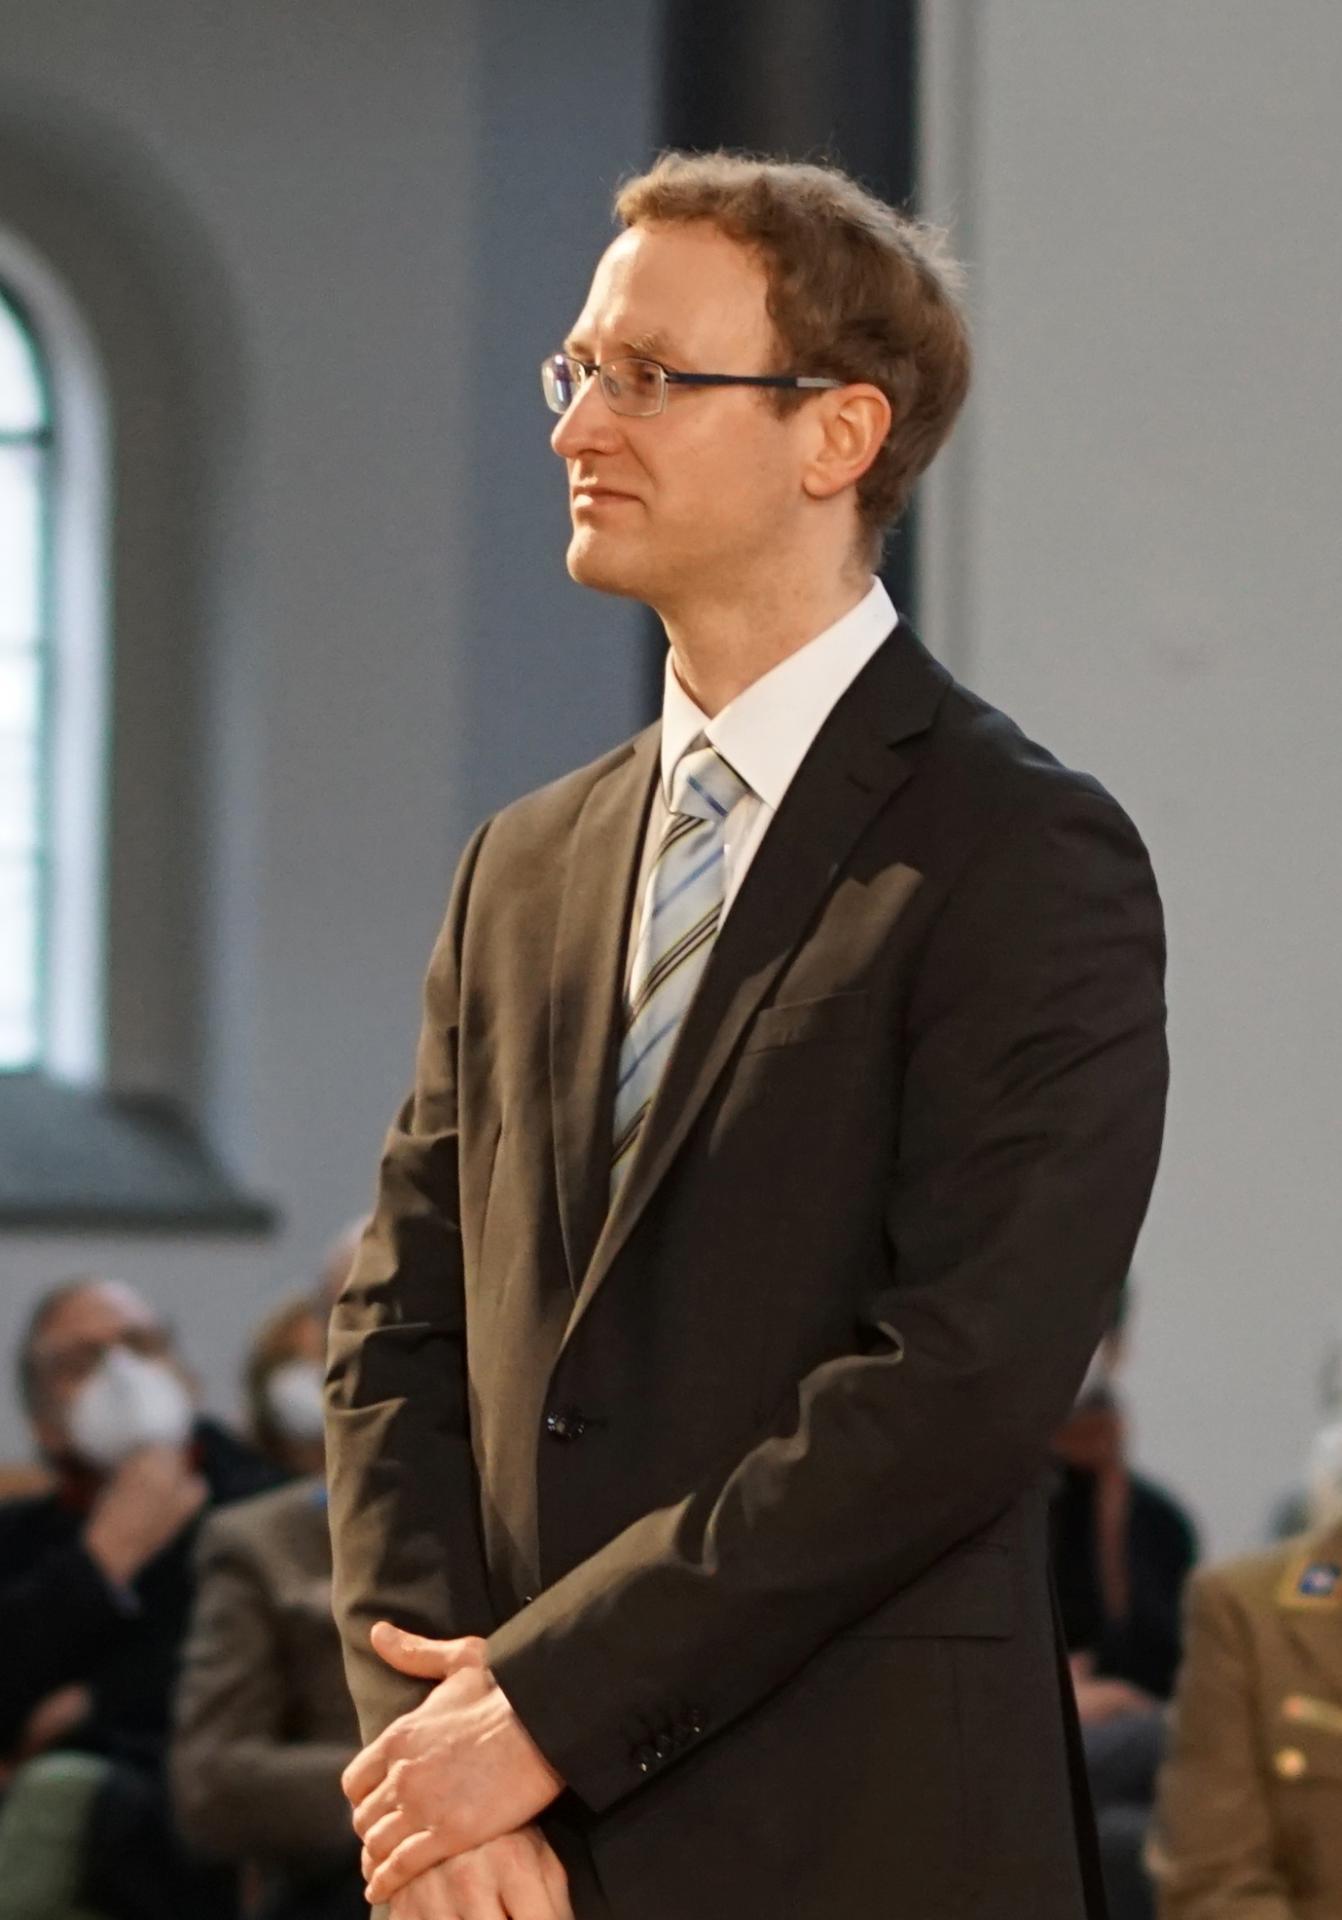 Pfarrer Christian Guth